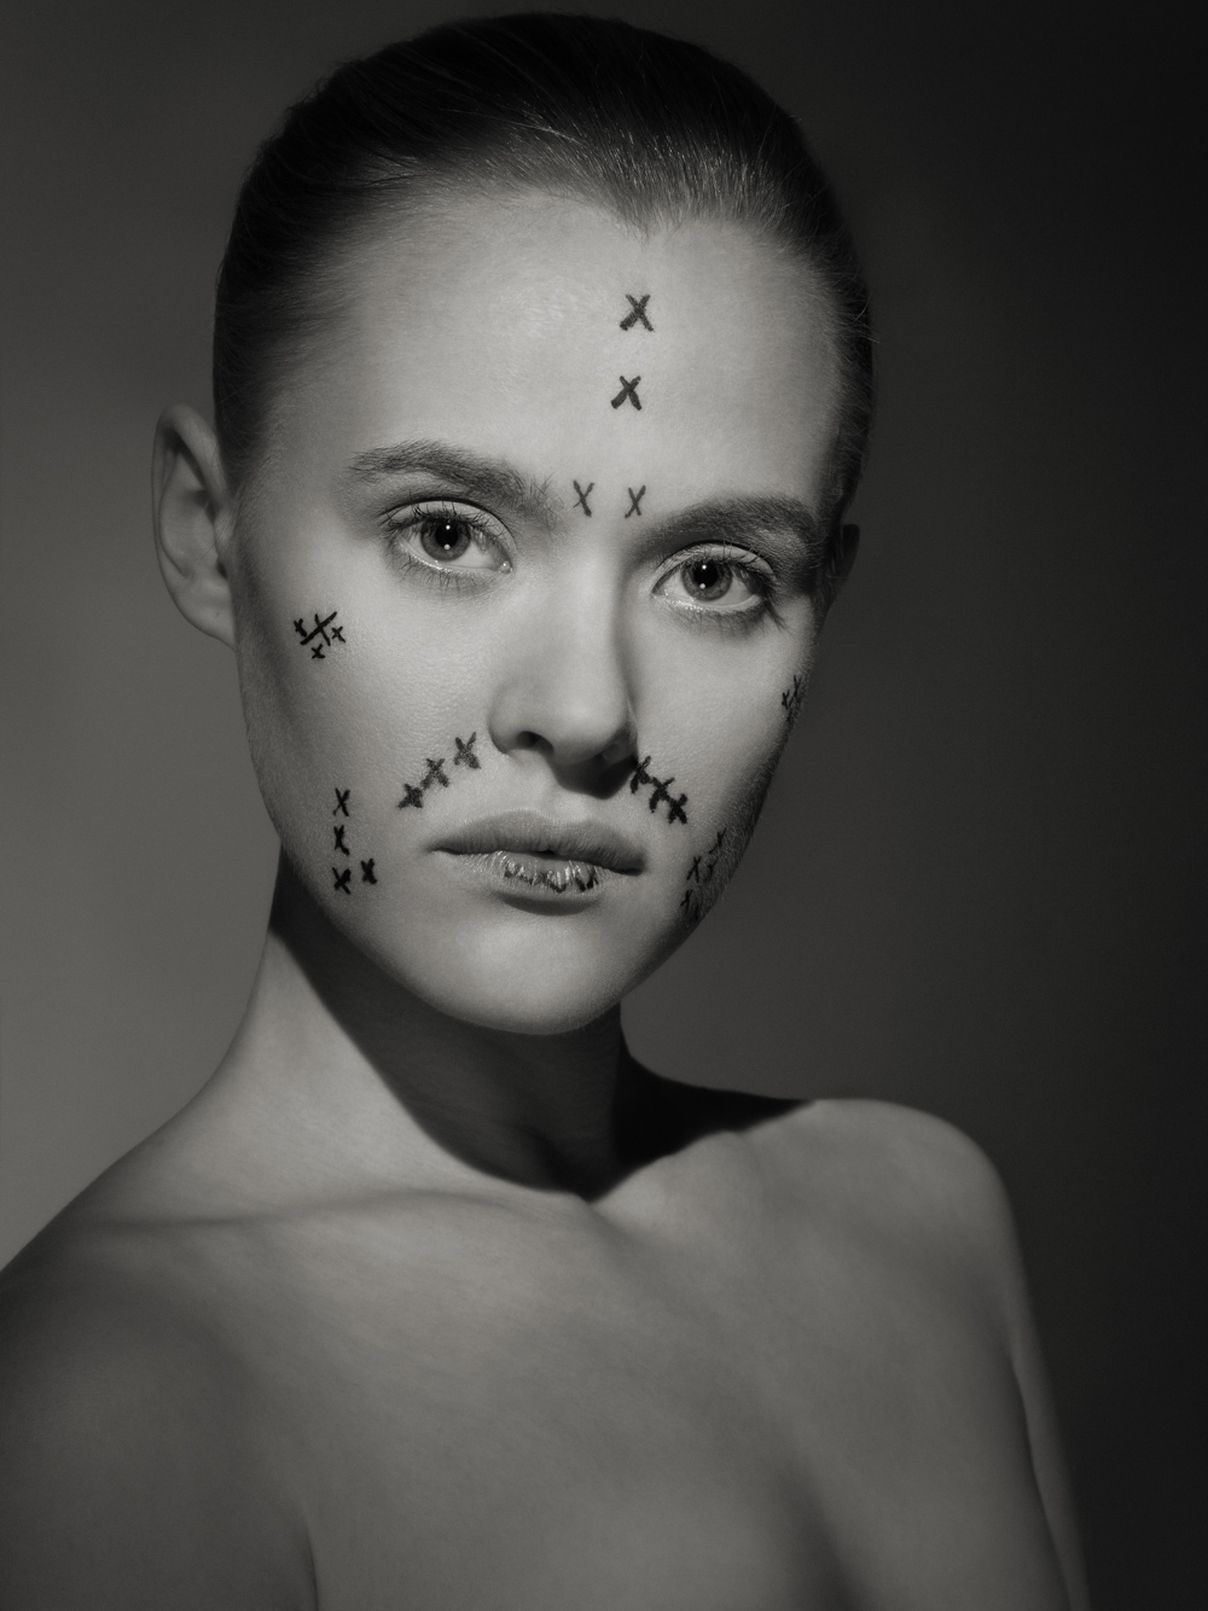 mask-perfection-plastic-surgery-everythingwithatwist-05